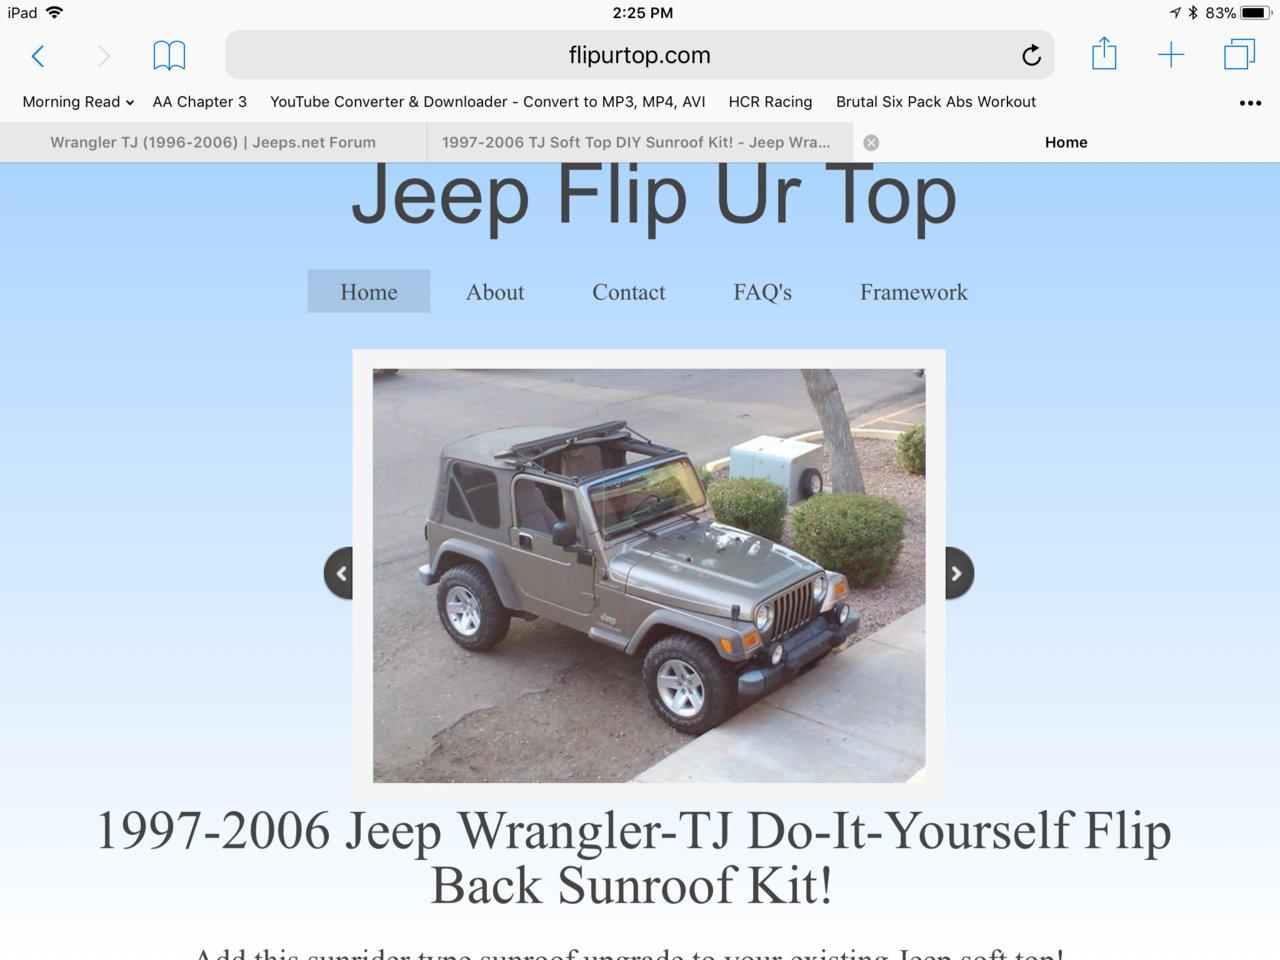 Flip UR Top bought one | Jeeps.net Forum